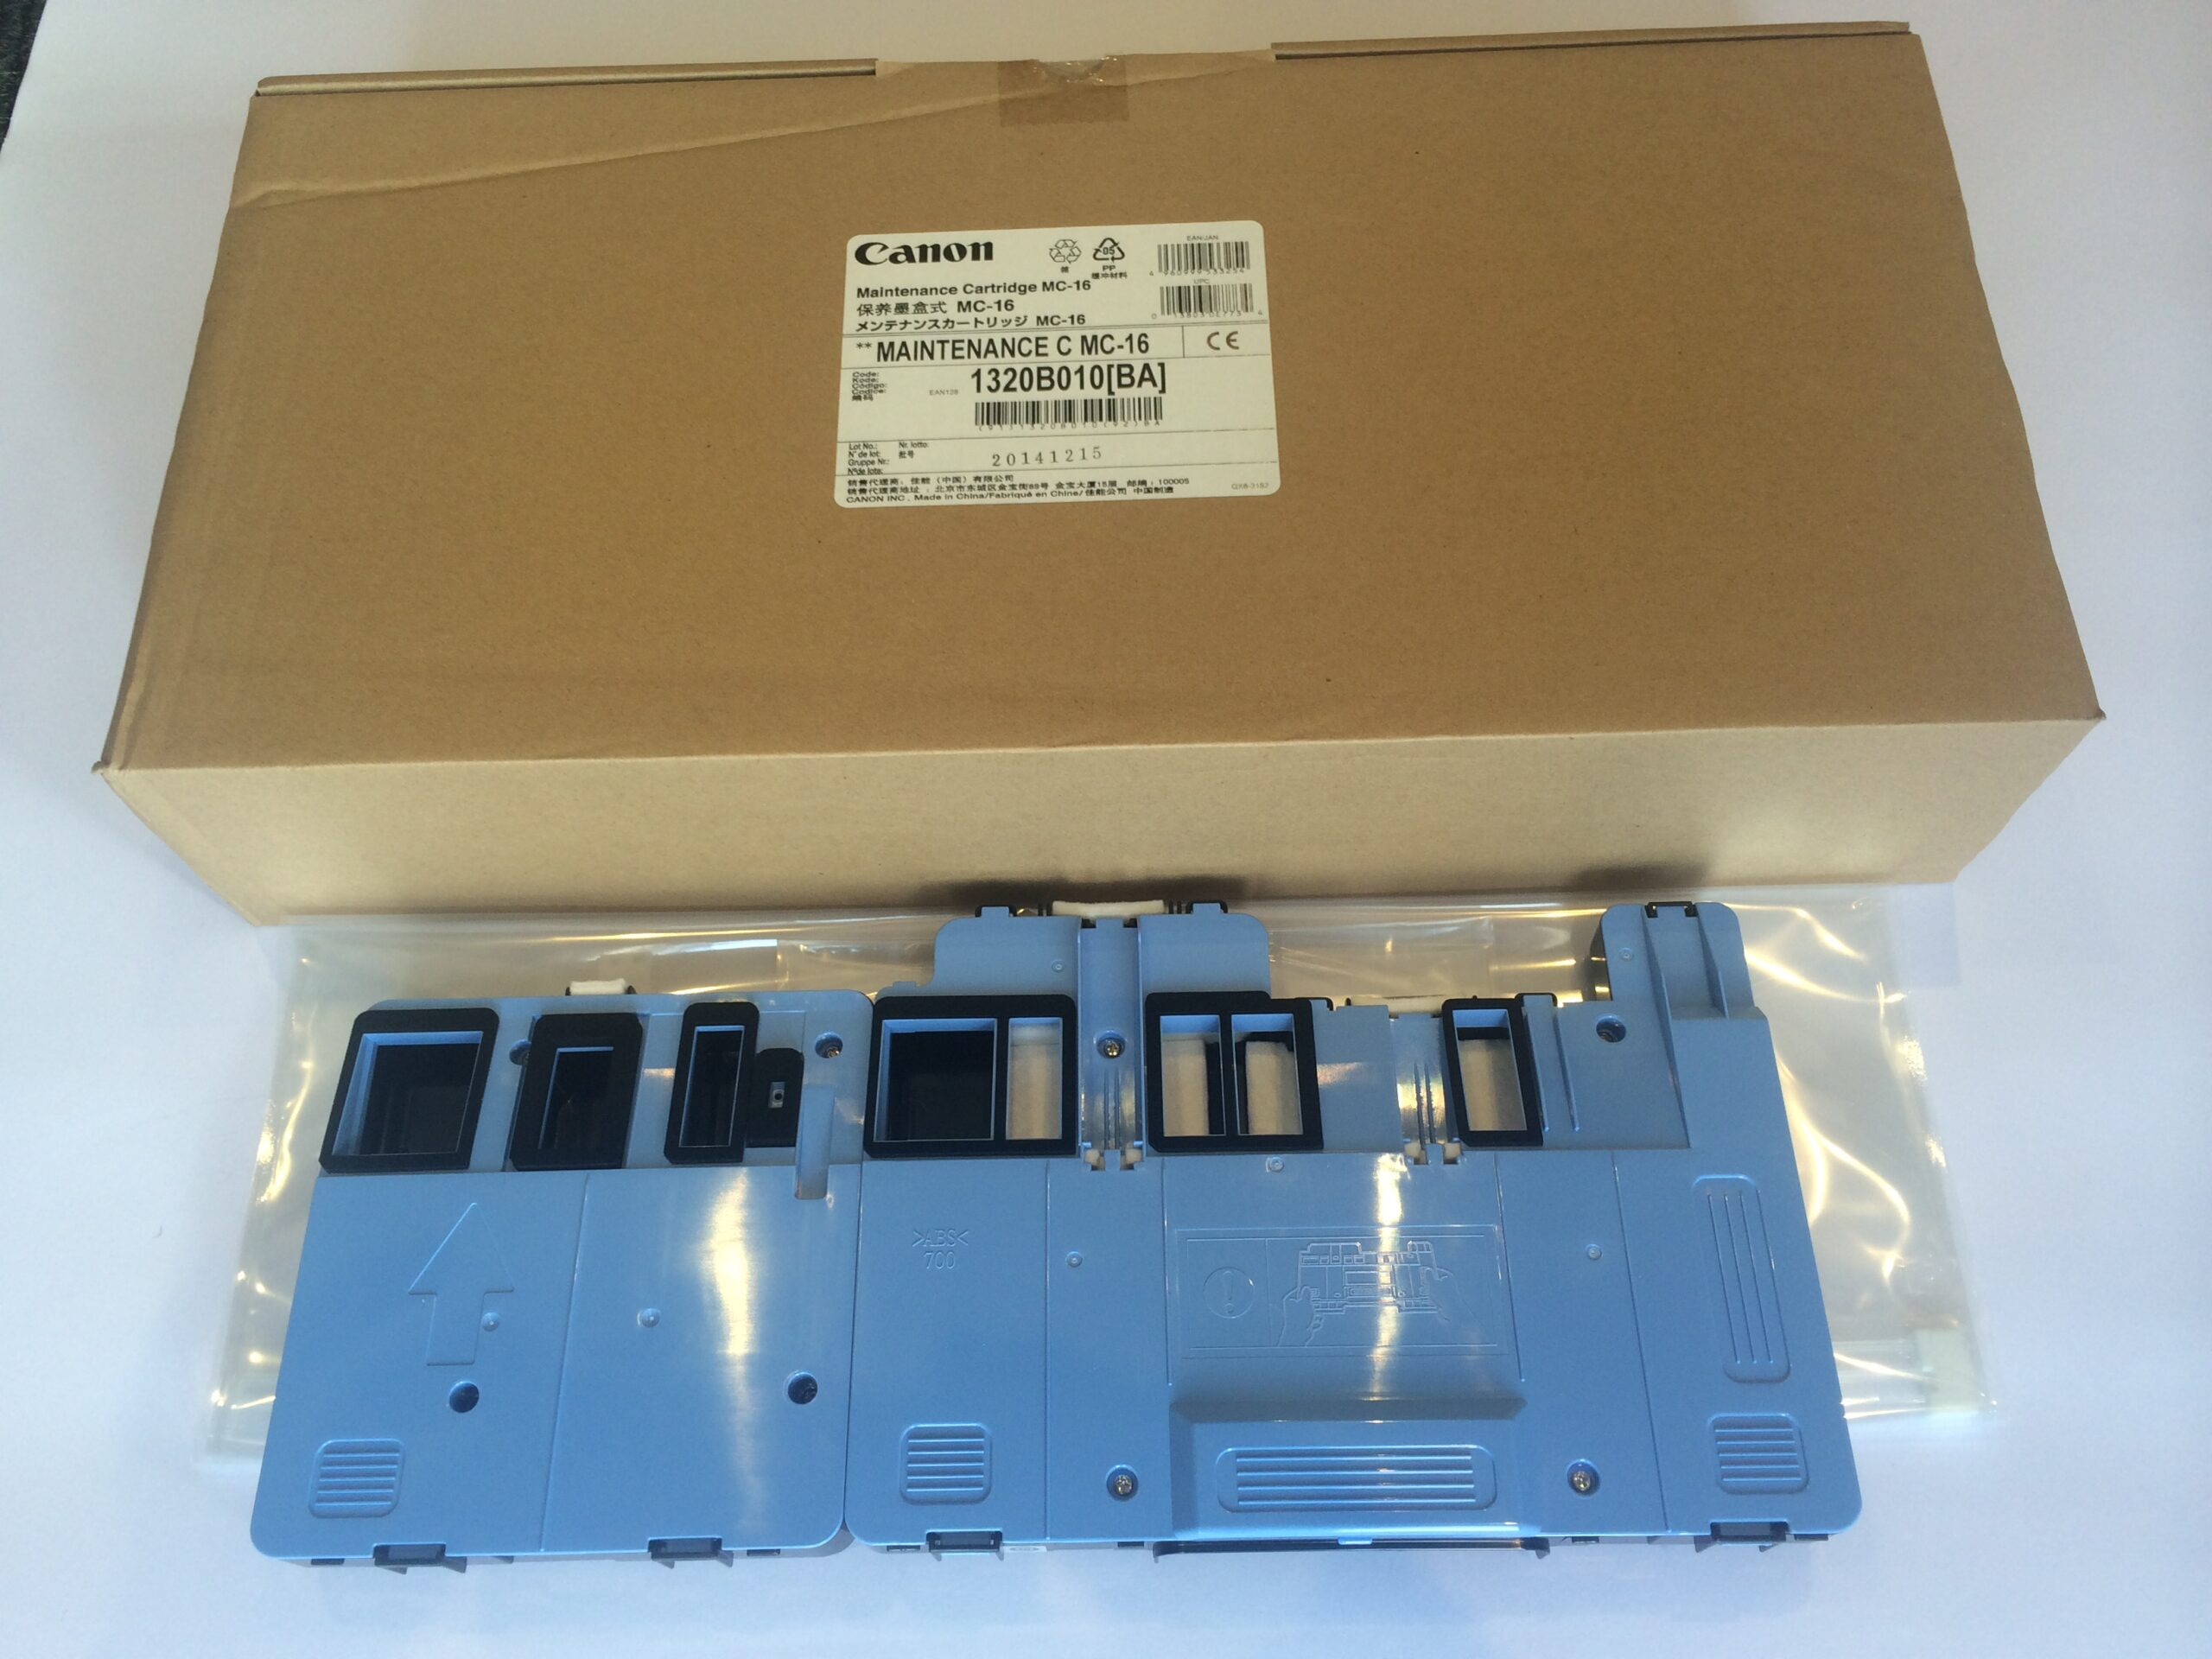 Oce MC-16 CS2124 CS2224 Maintenance Cartridge 29952394 (previously 29800053)